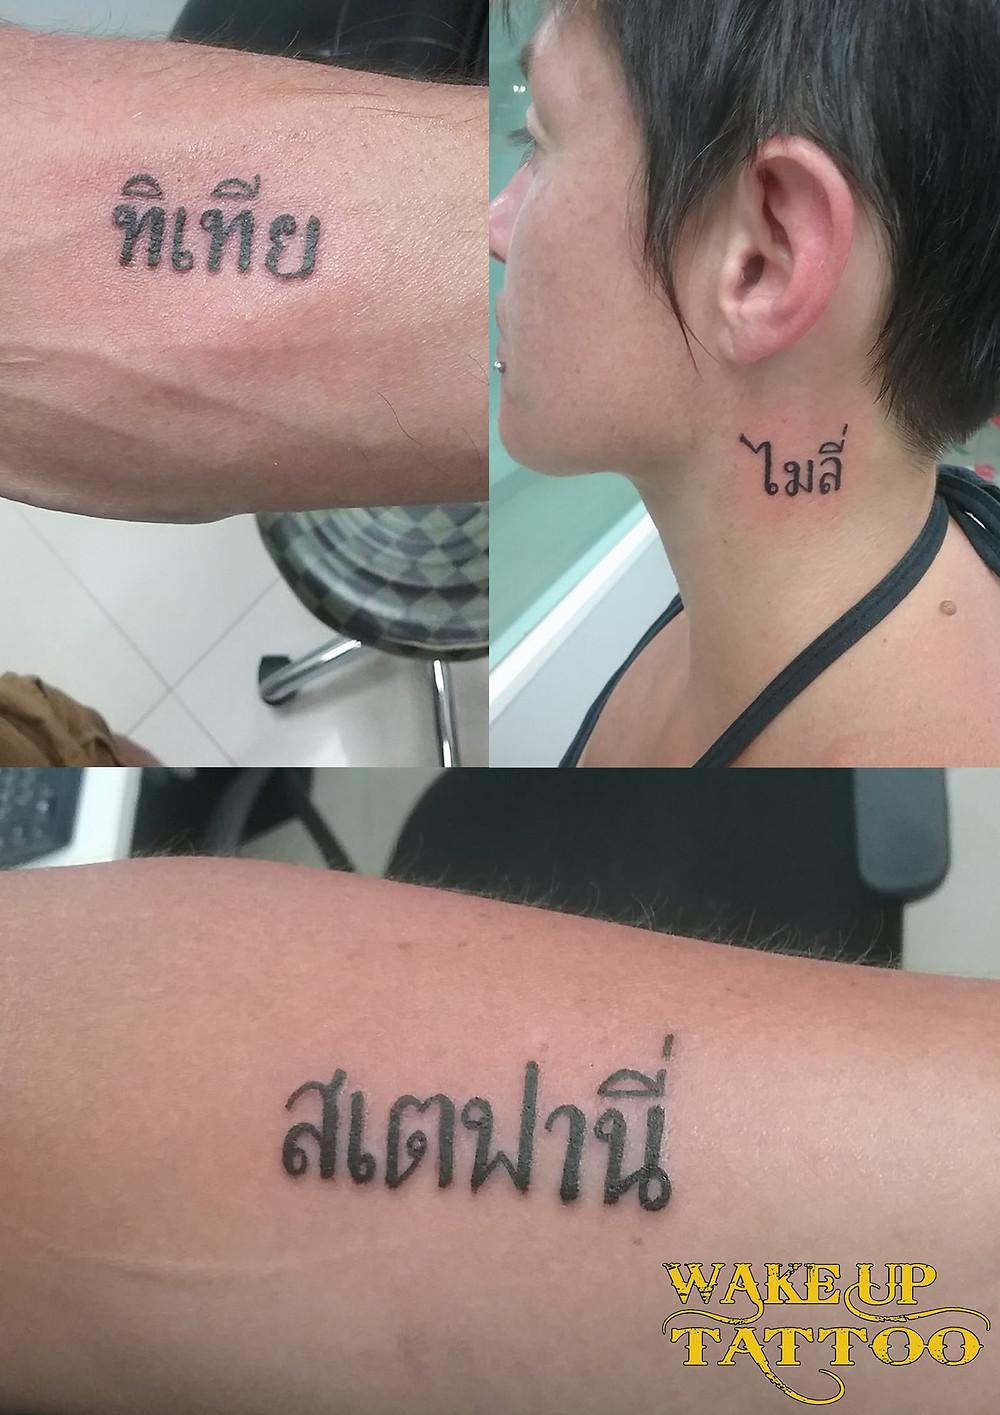 Thai character tattoo by Wake up tattoo at Patong Beach Phuket Thailand